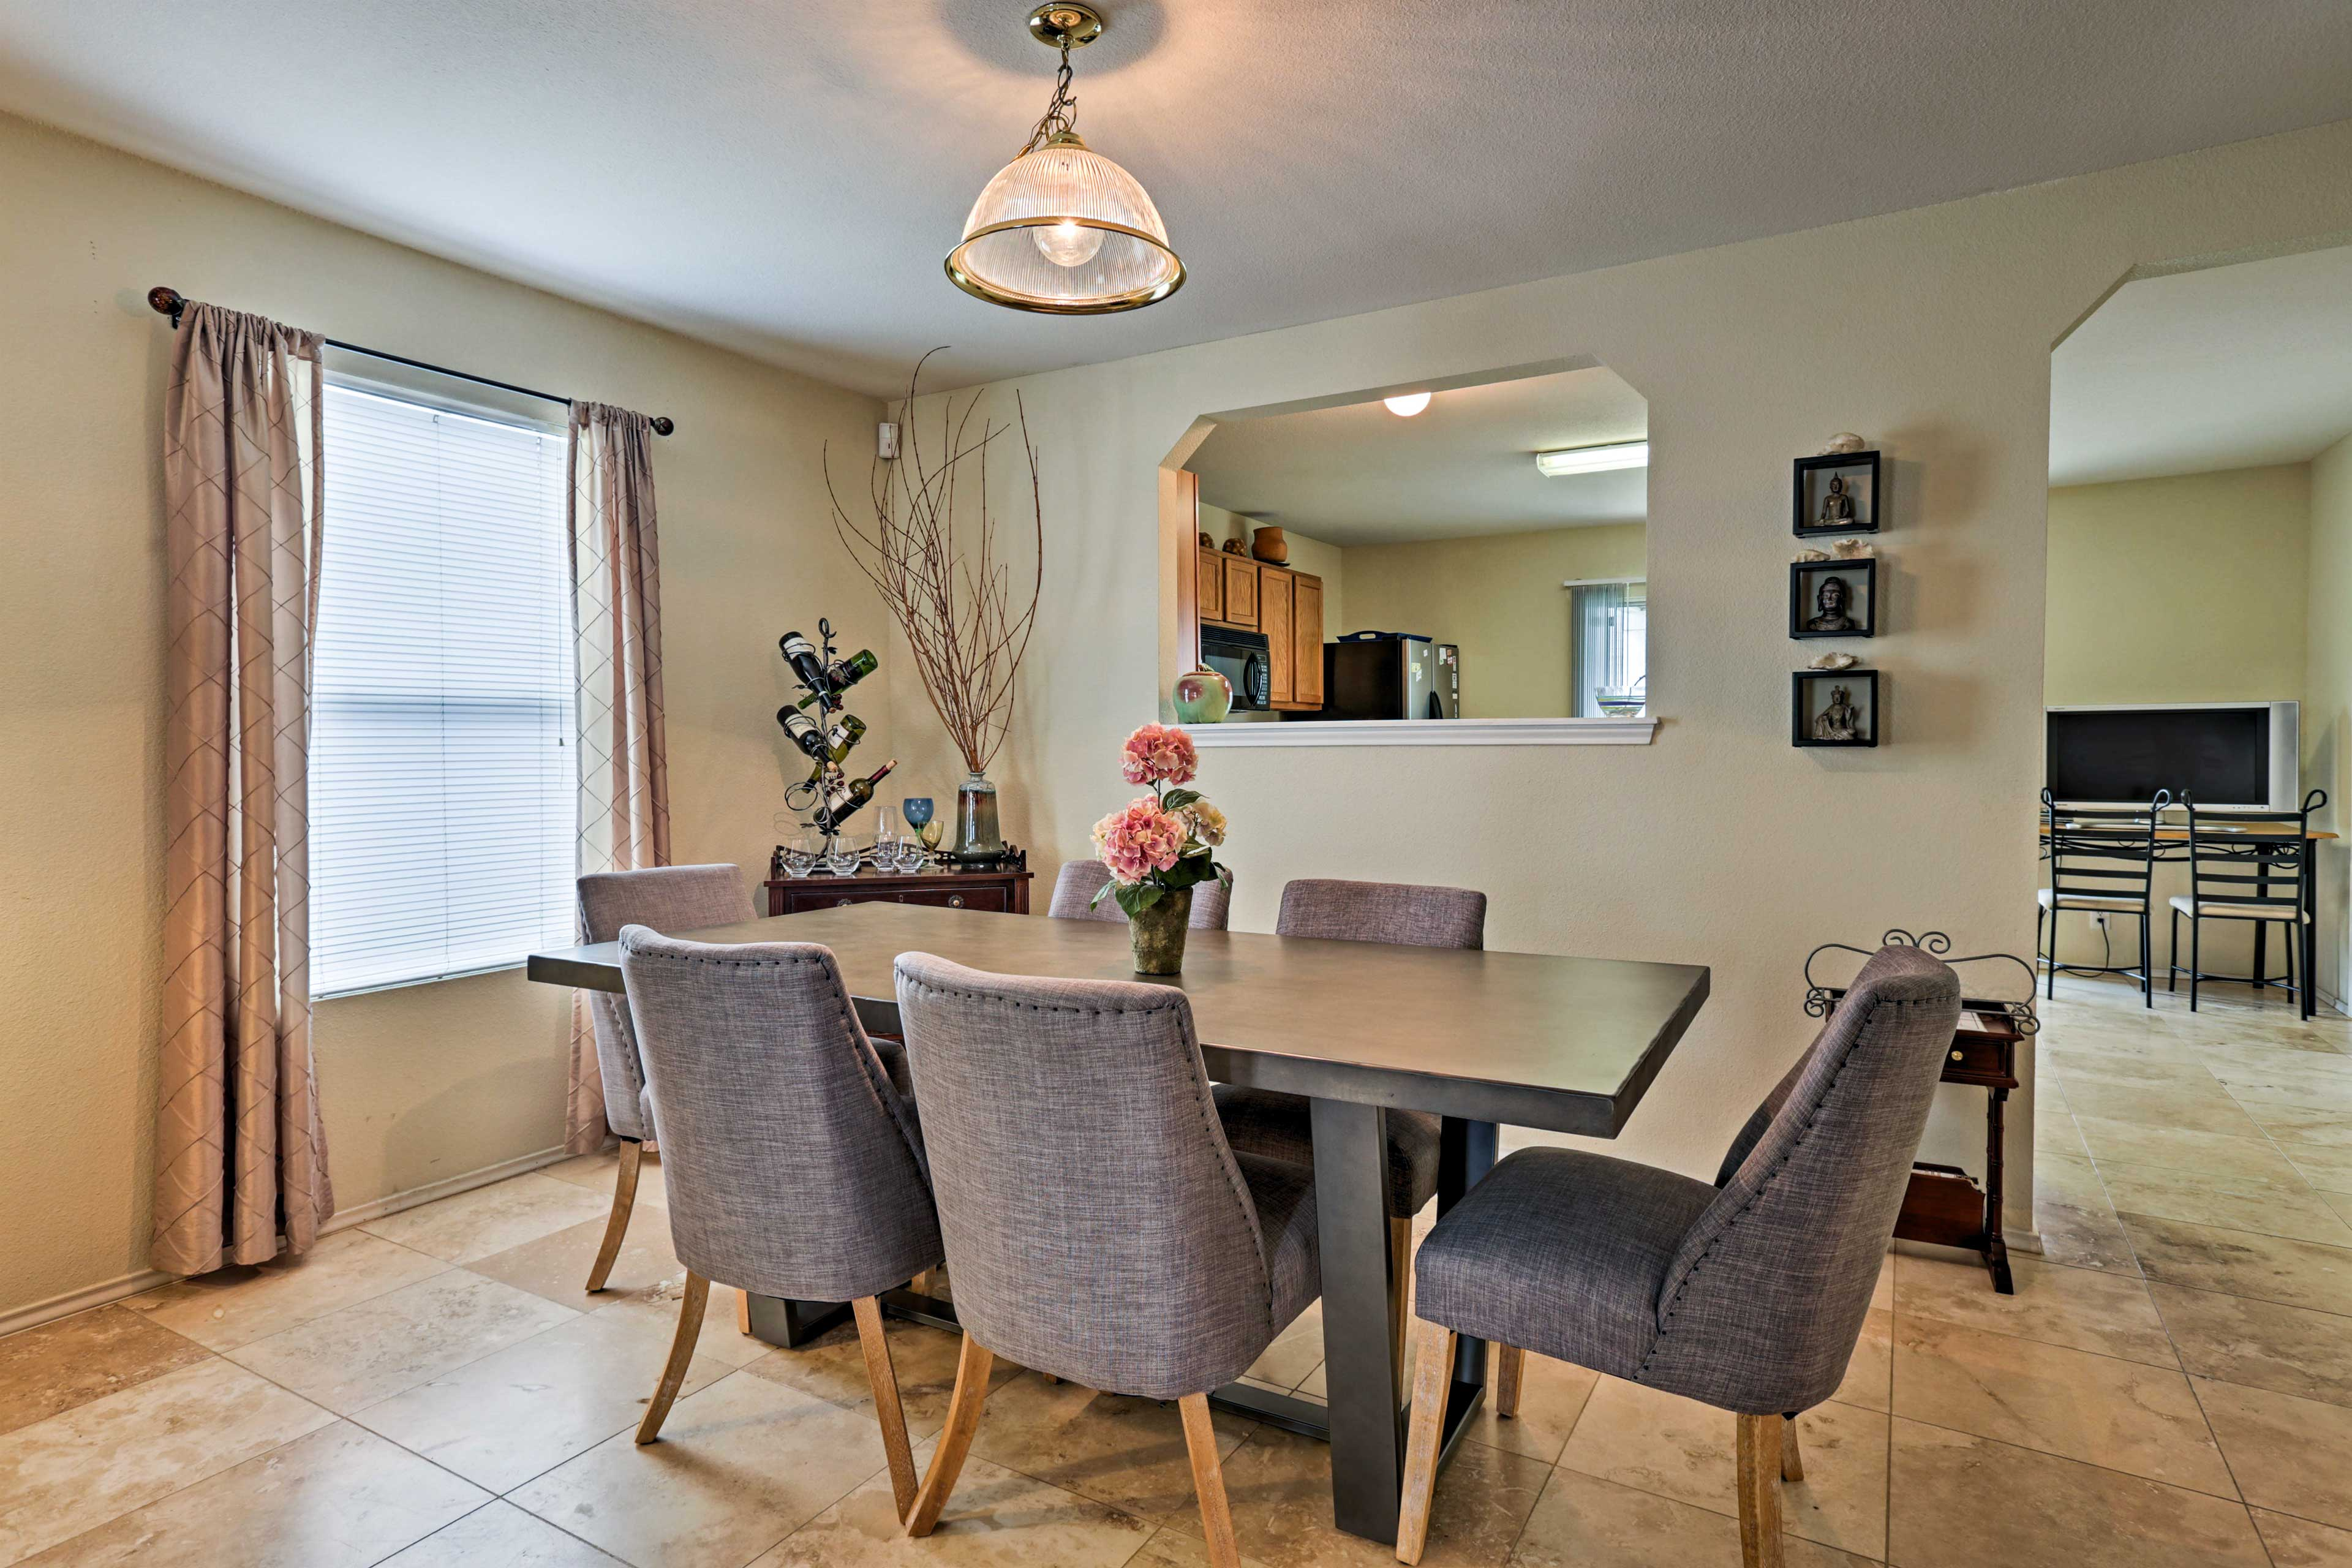 Dining Room | 1st Floor | Dishware/Flatware Provided